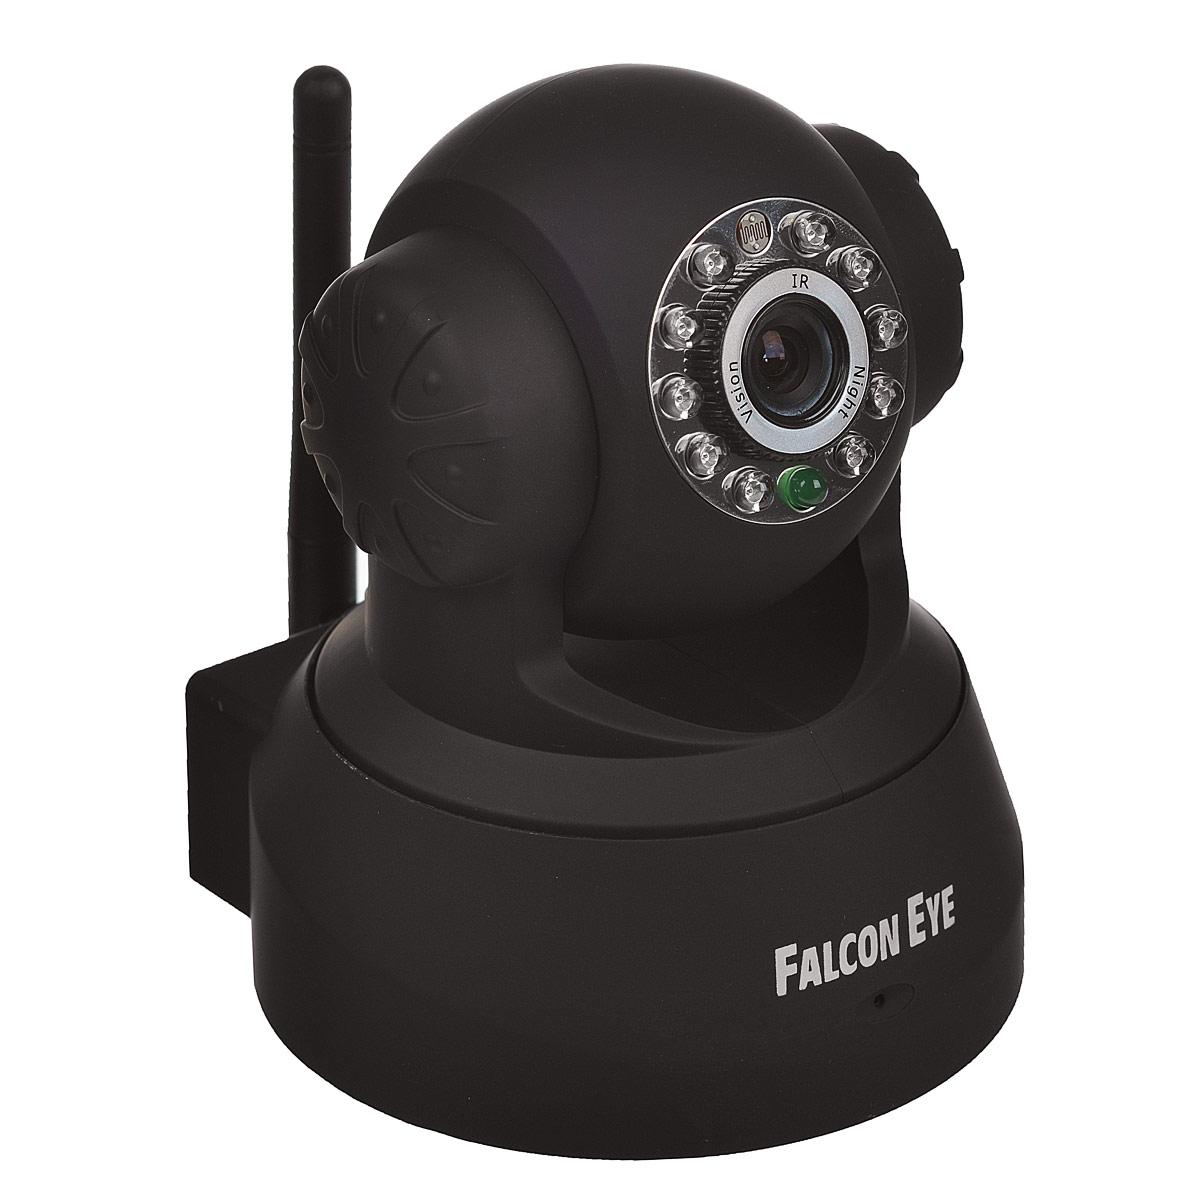 Falcon Eye FE-MTR300-P2P, Black беcпроводная камера видеонаблюдения